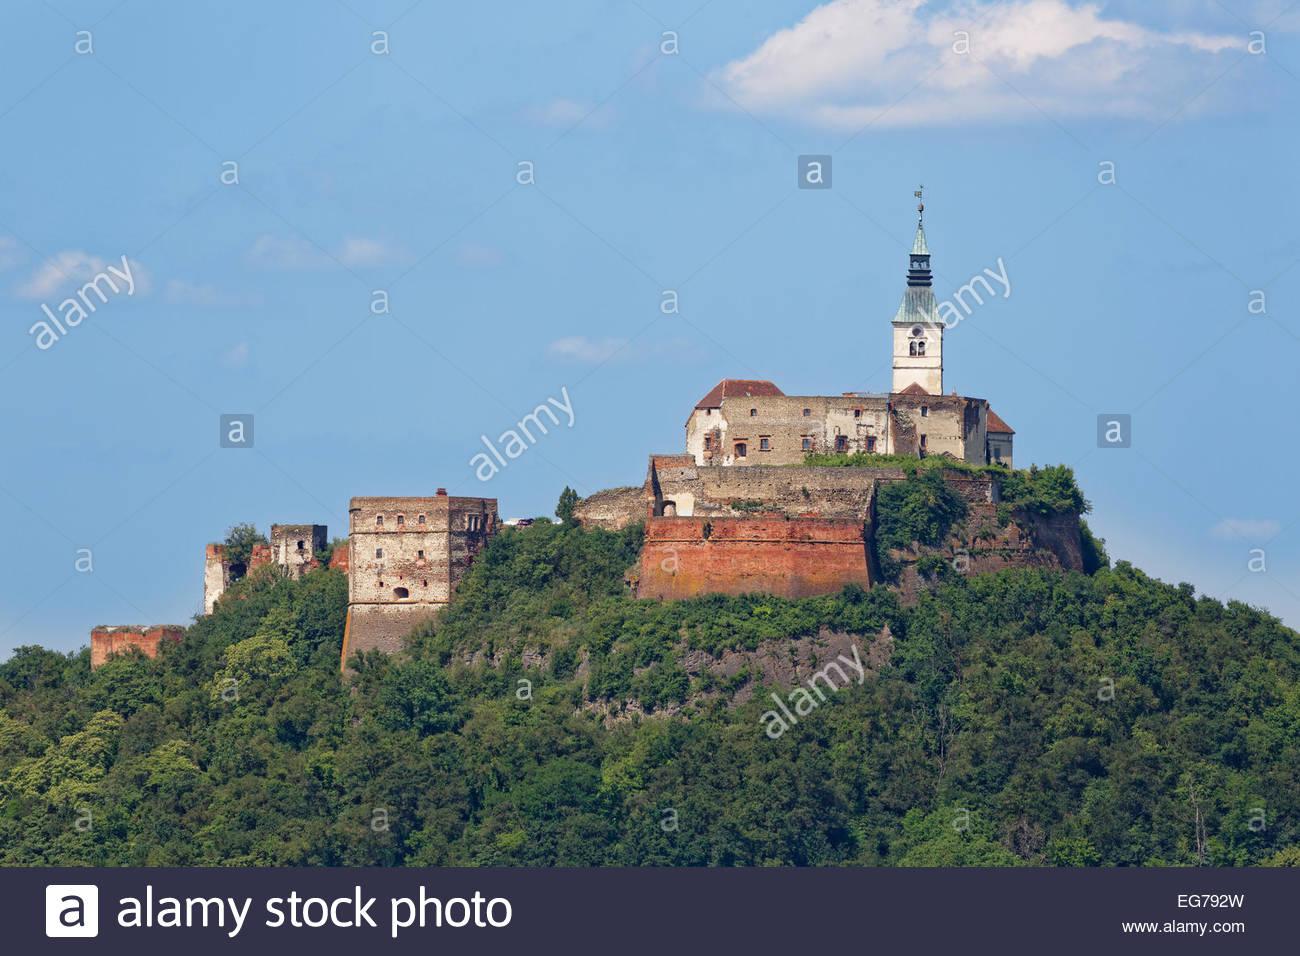 Austria, Burgenland, Stremtal, Guessing castle - Stock Image